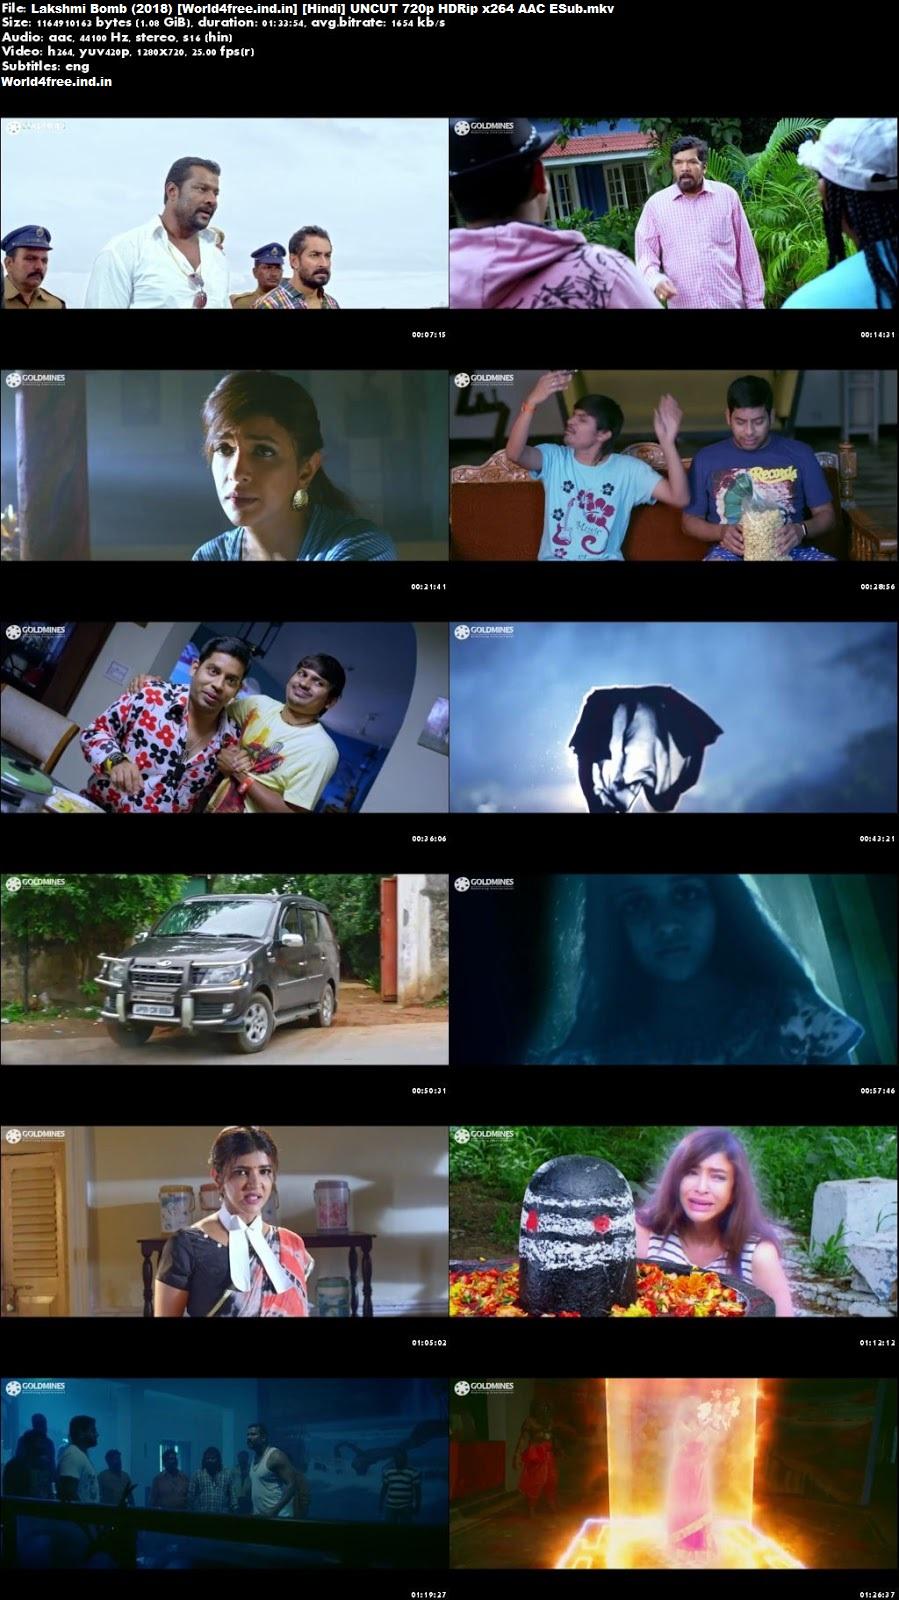 Lakshmi Bomb 2018 world4free HDRip 720p Hindi Dubbed Movie Download